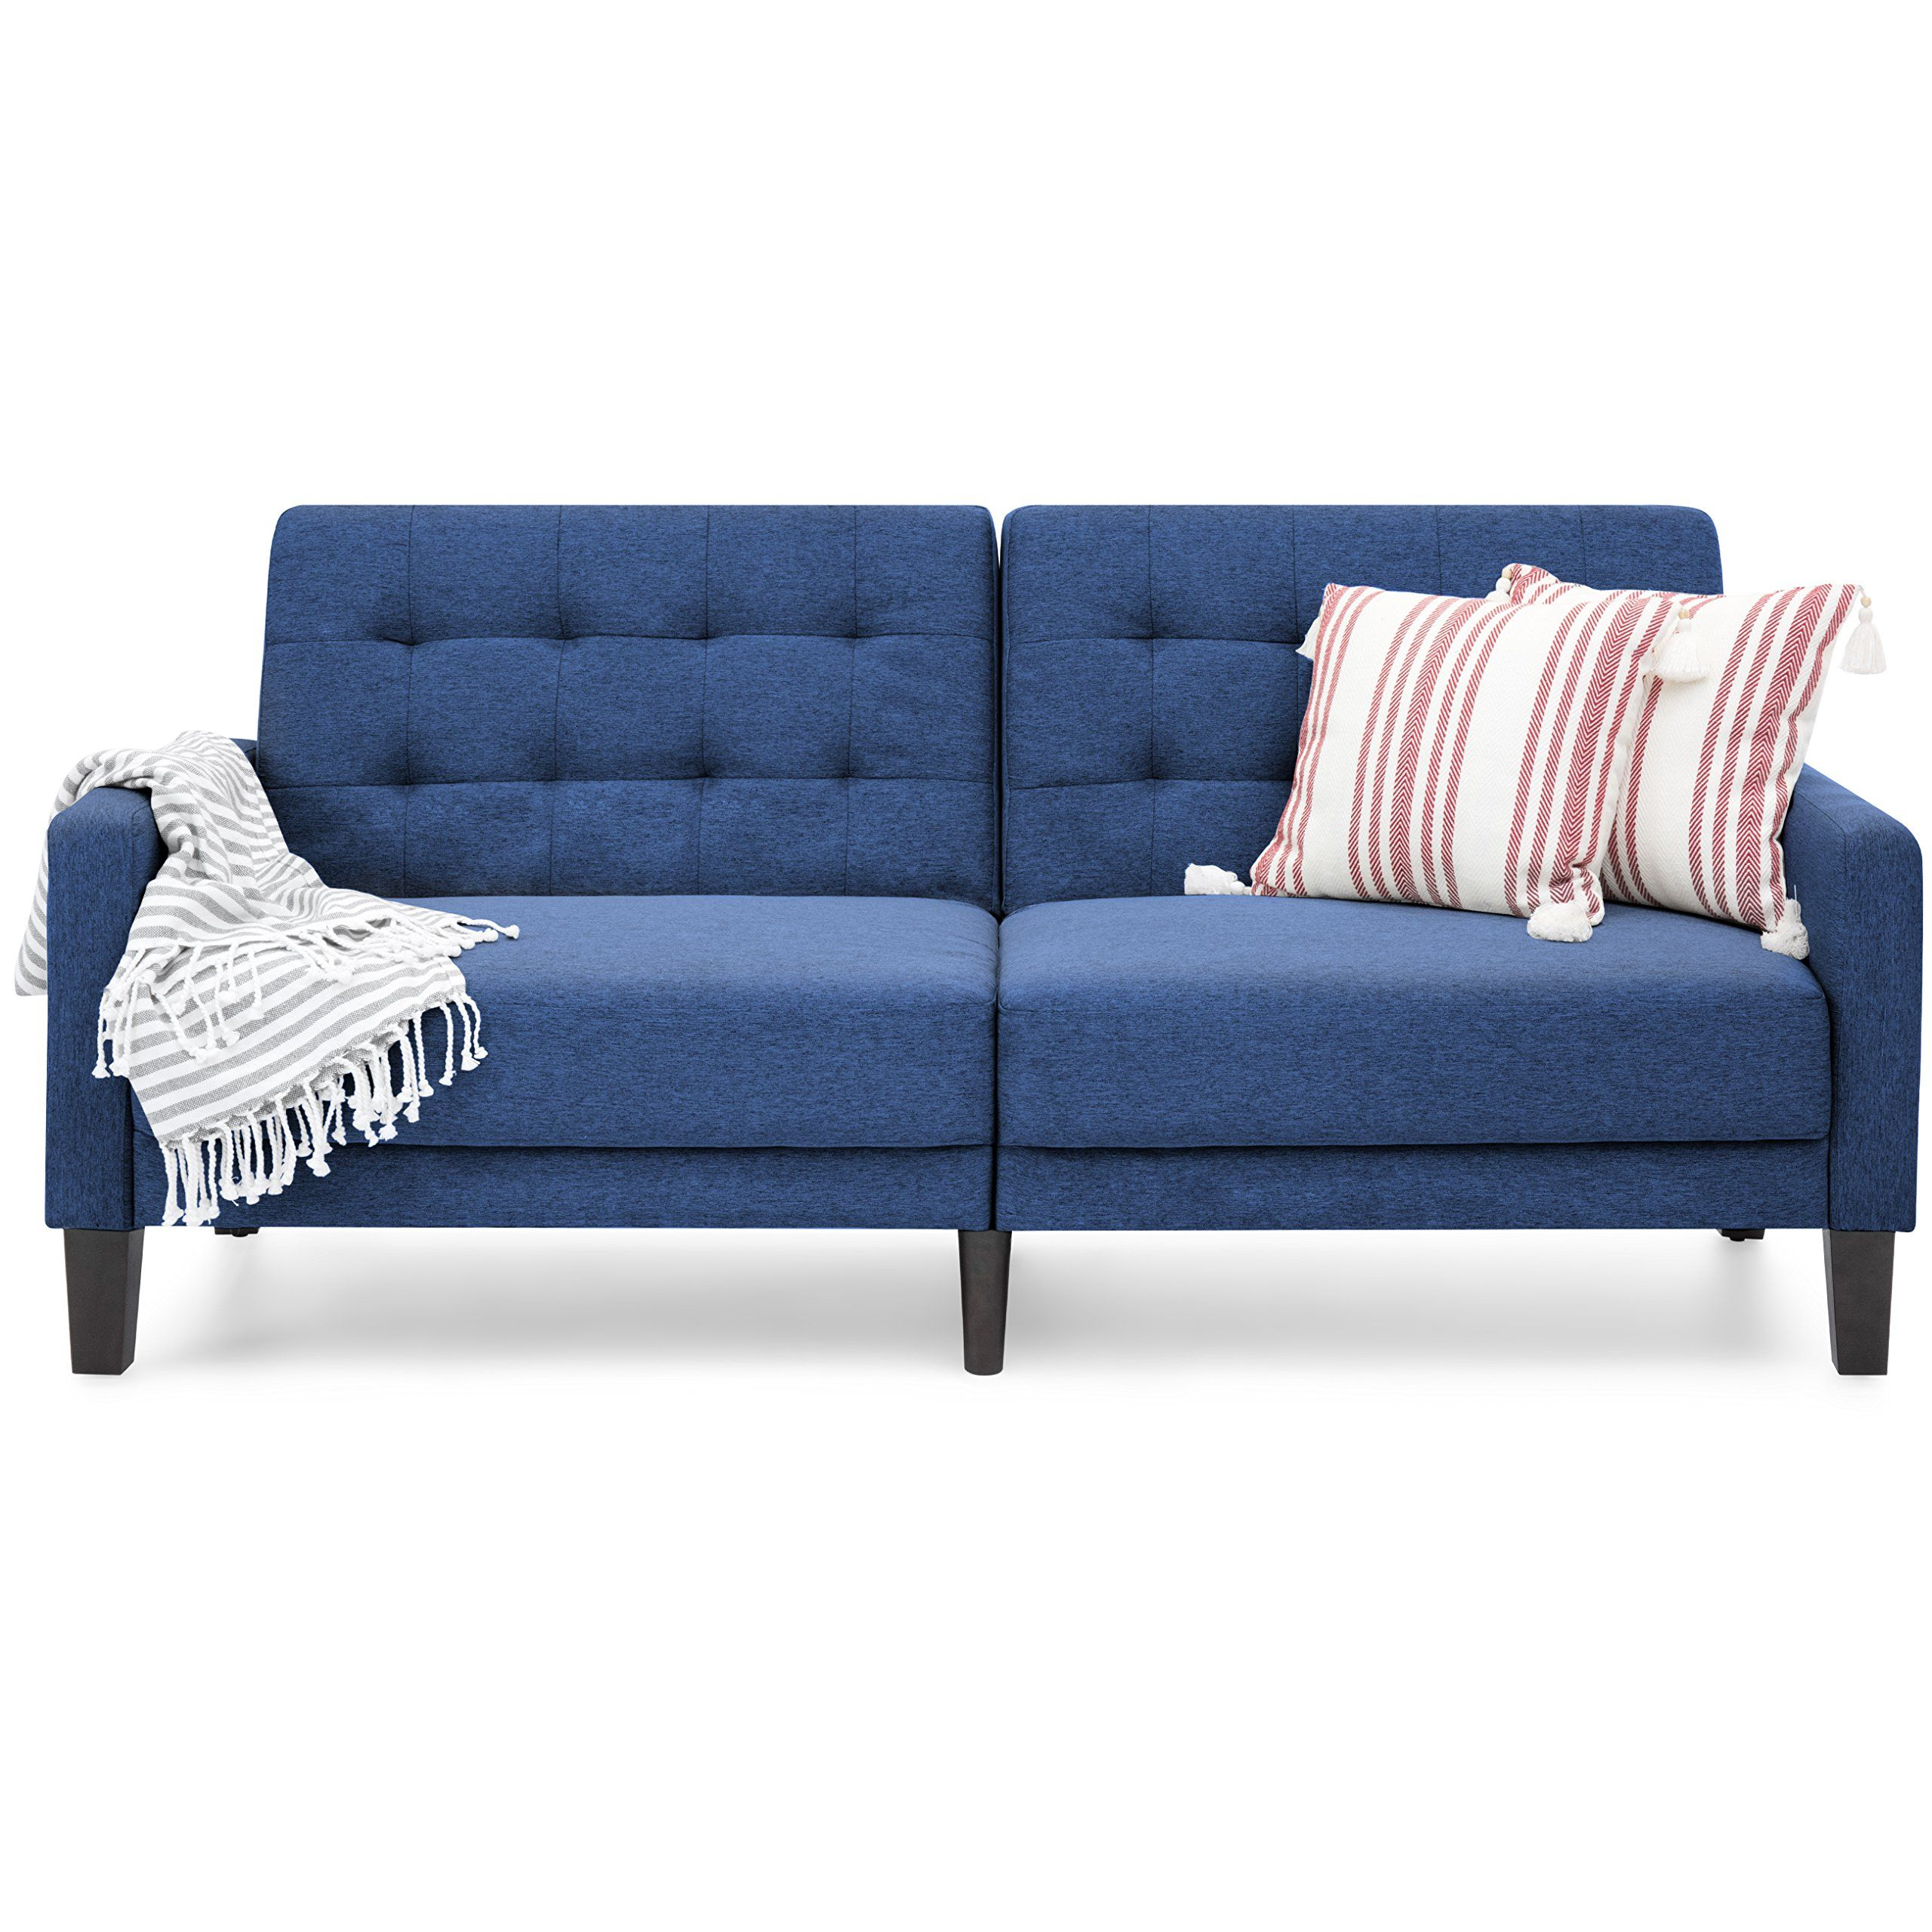 Linen tufted convertible sofa futon sleeper versatile split back